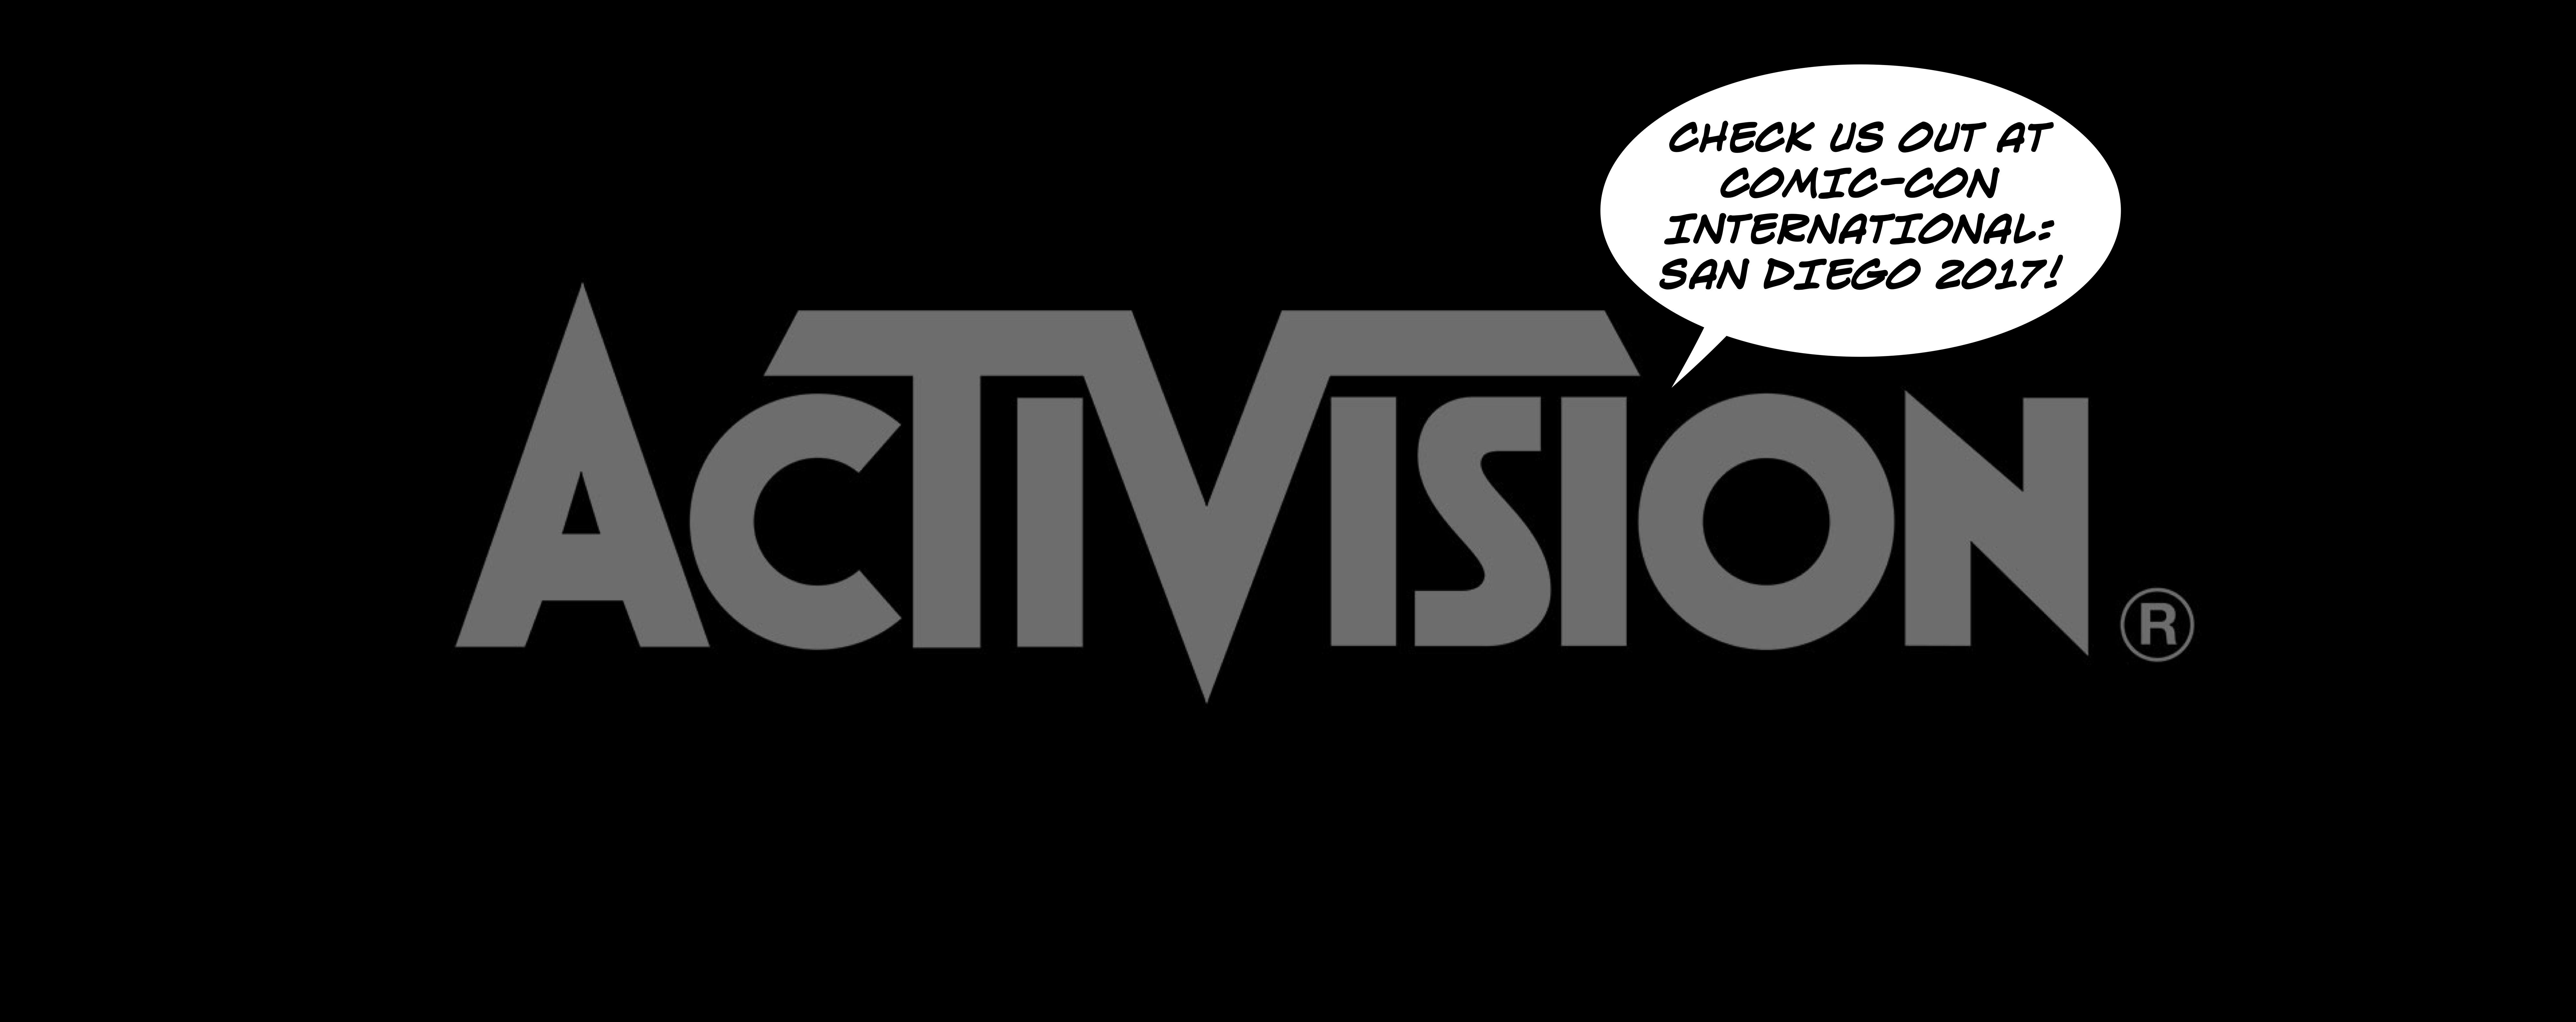 logo activision png transparent logo activisionpng images